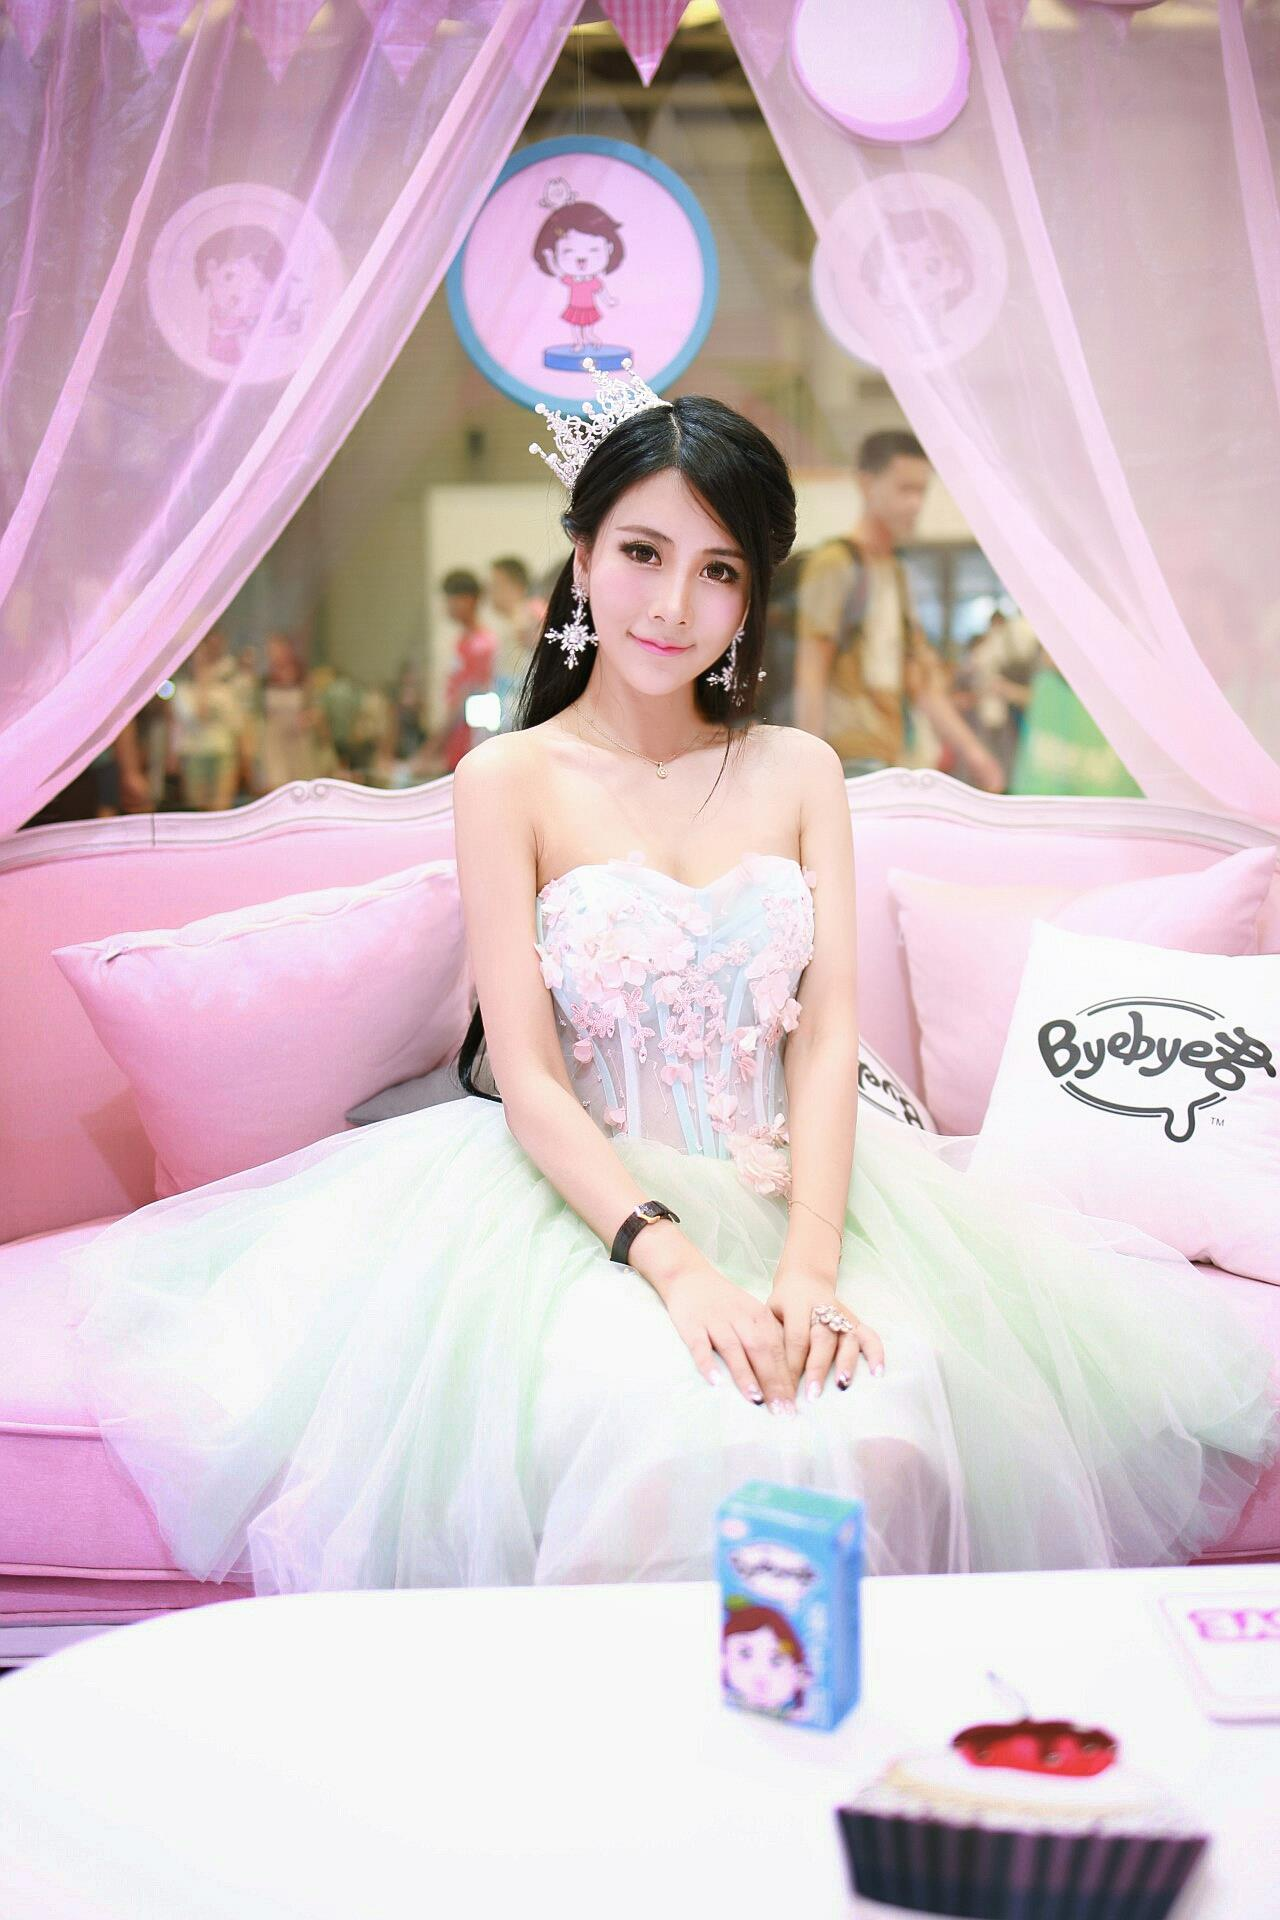 2017ChinaJoy展 抹胸女王裙装扮的美女何雨薇梦幻般写真